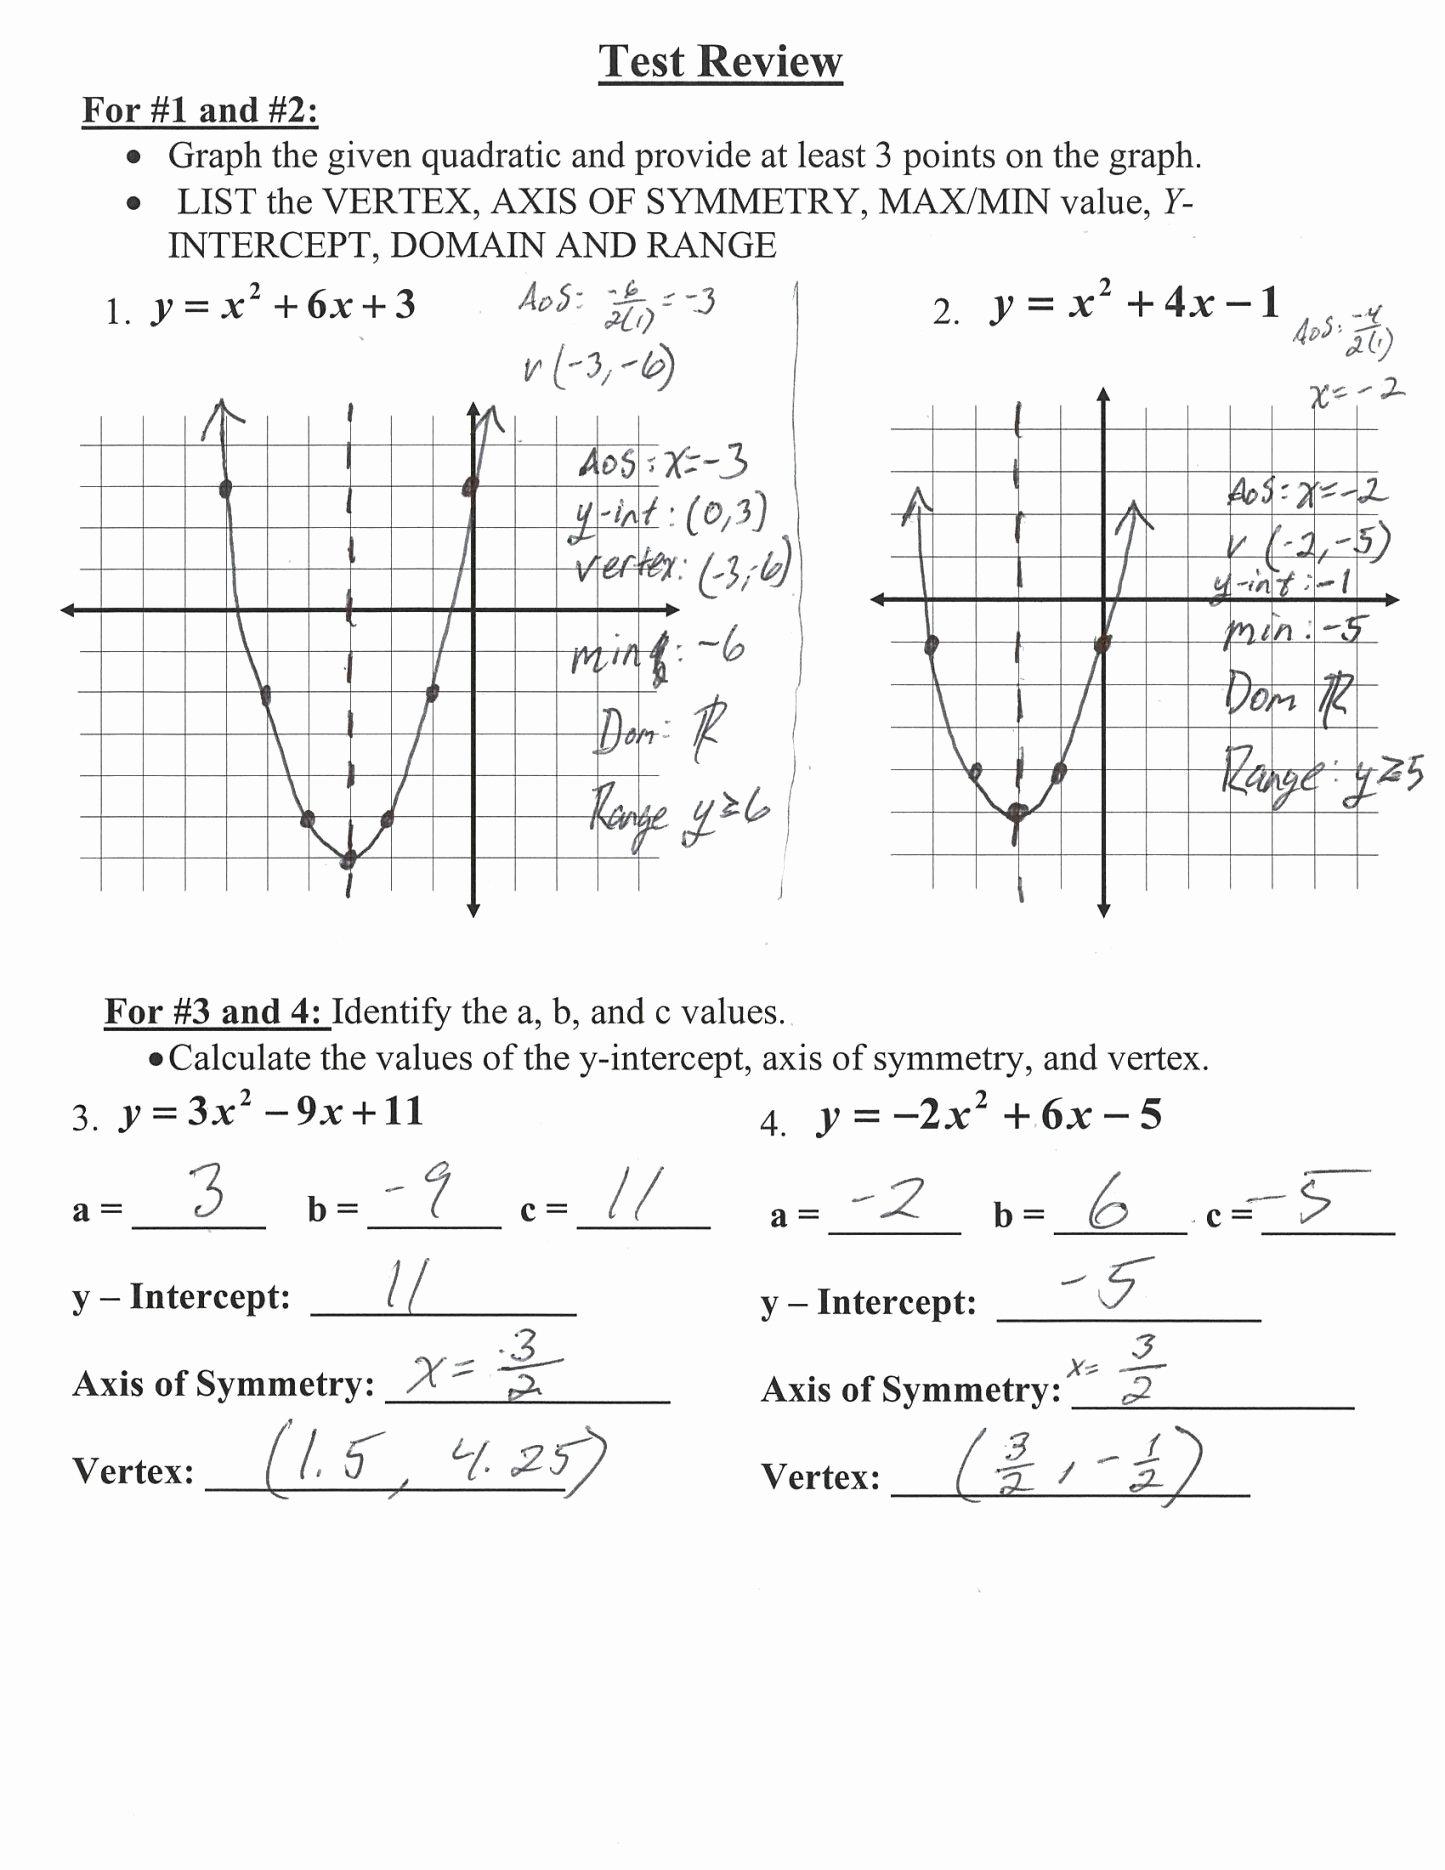 Domain and Range Practice Worksheet Kids Math Worksheet 3 Domain and Range